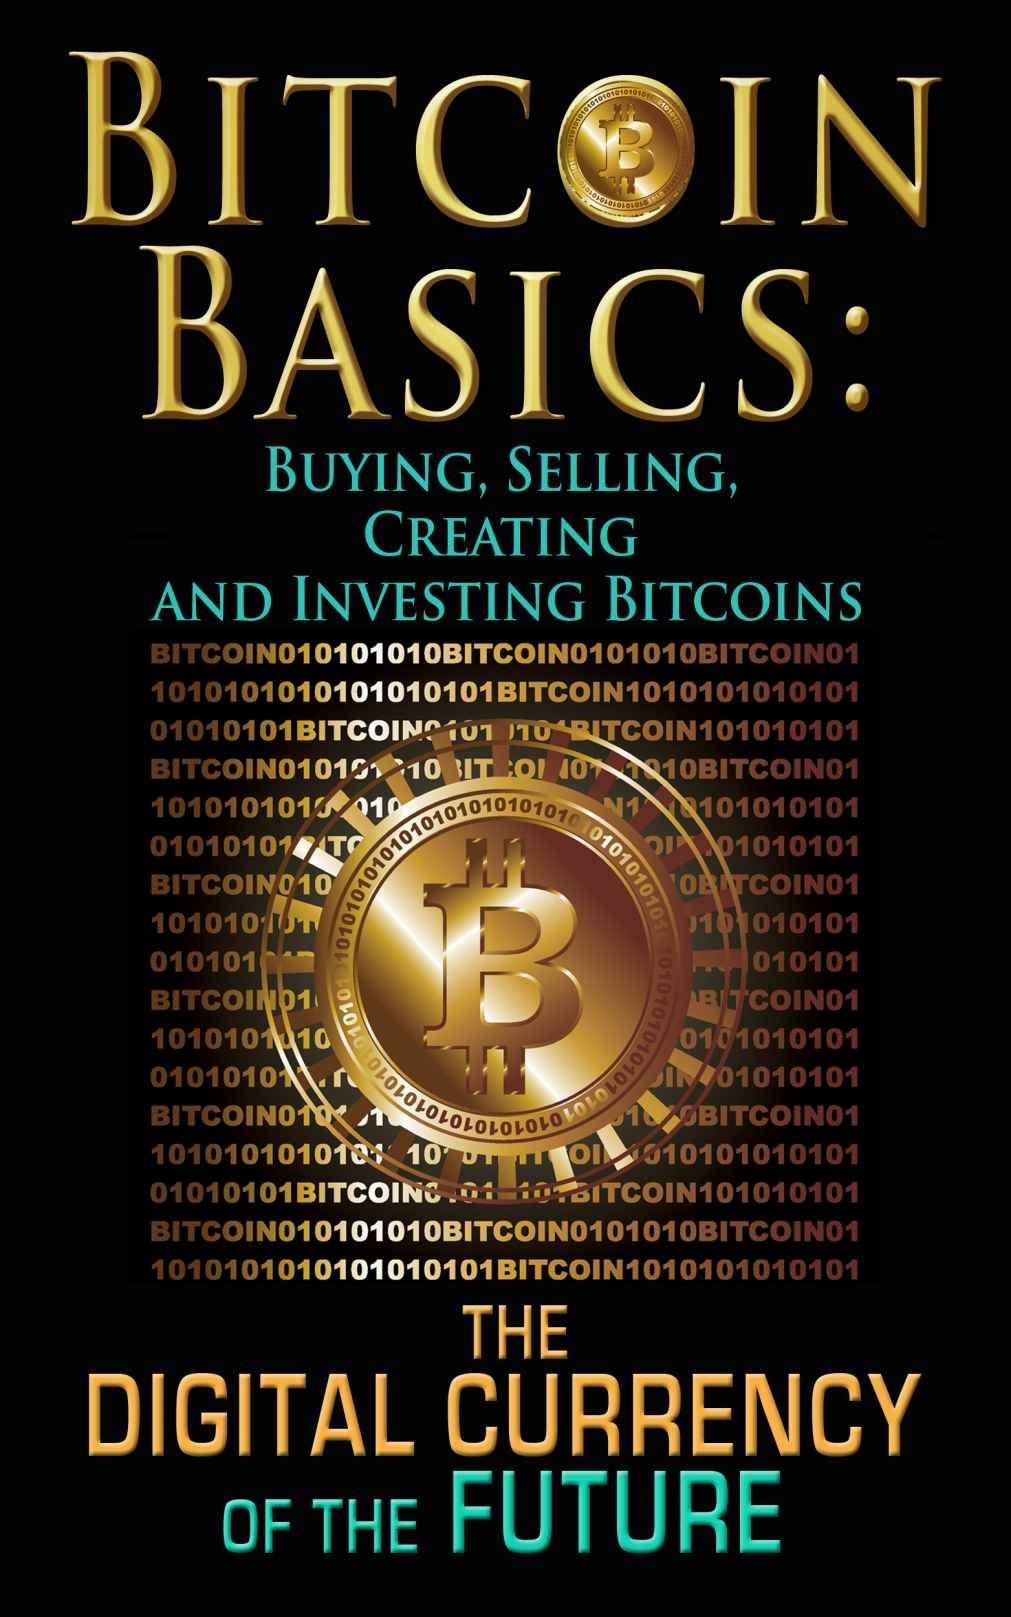 Bitcoin basics buying selling creating and investing